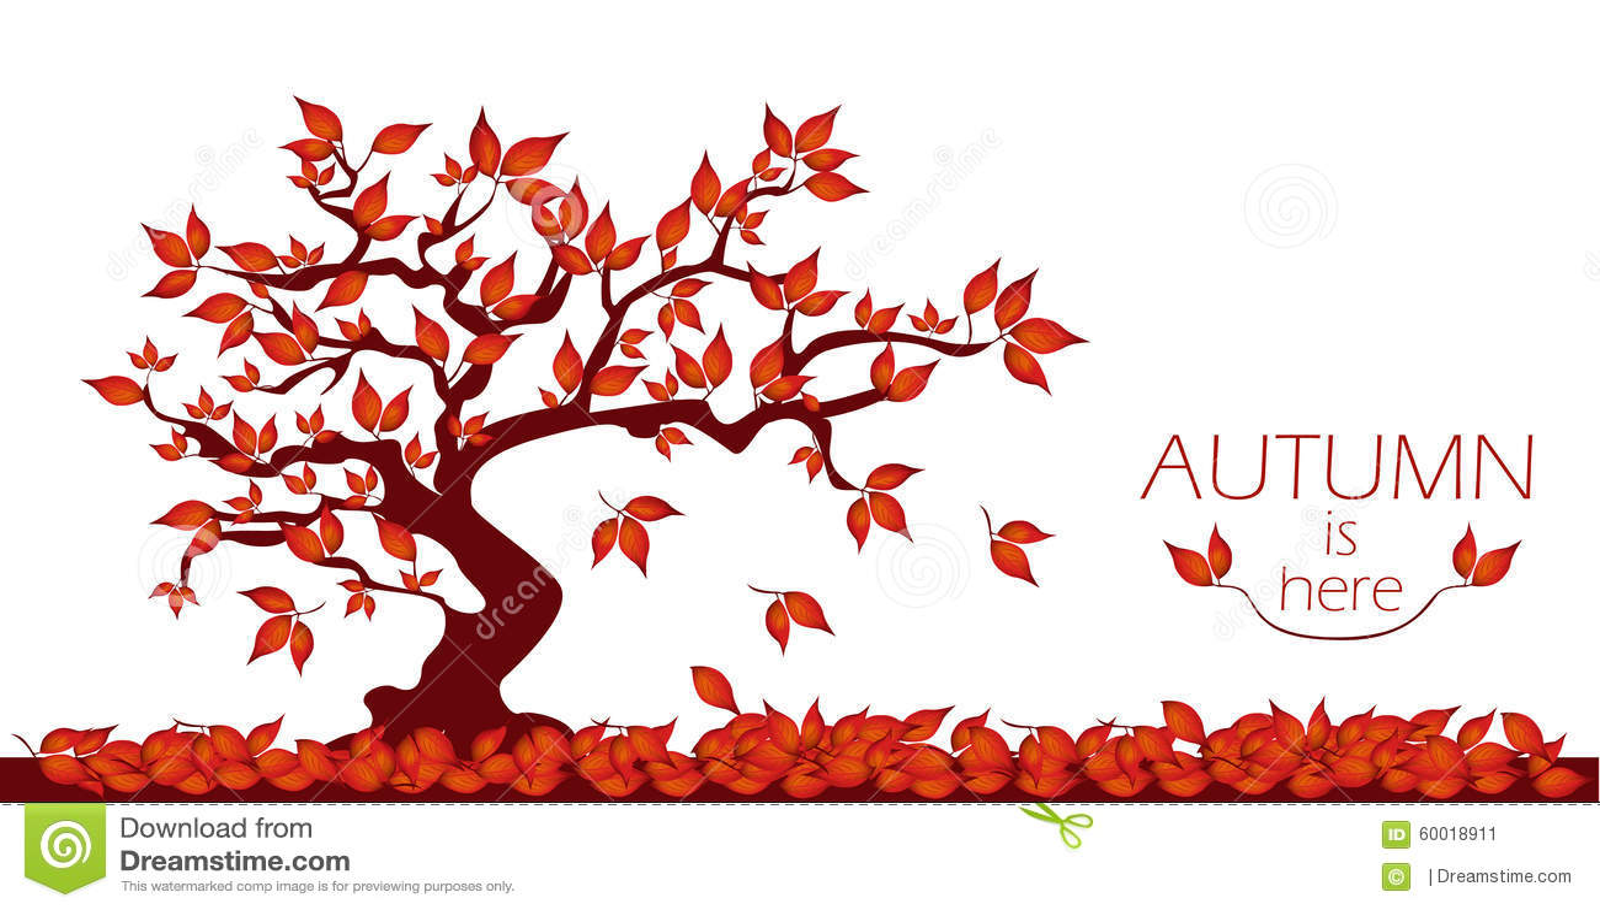 foliage clip art